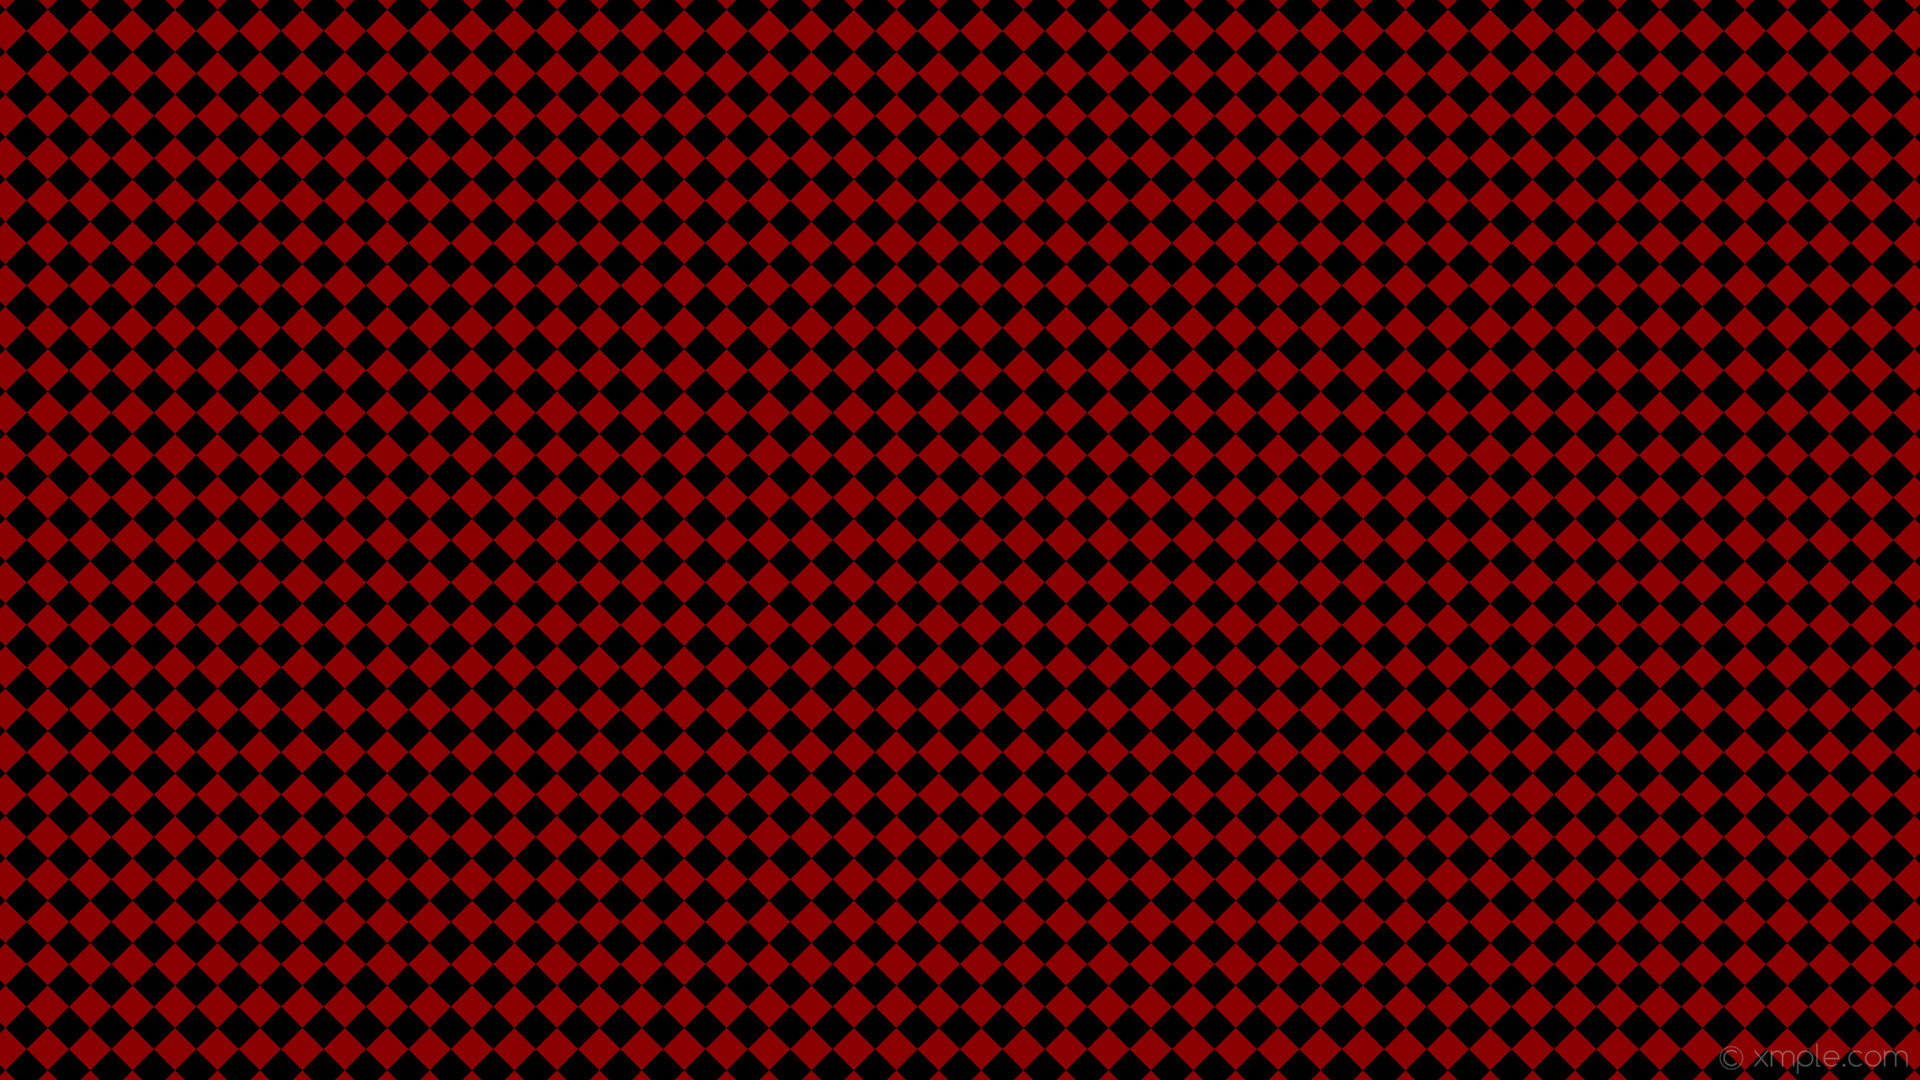 wallpaper checkered squares red black dark red #8b0000 #000000 diagonal 45°  30px